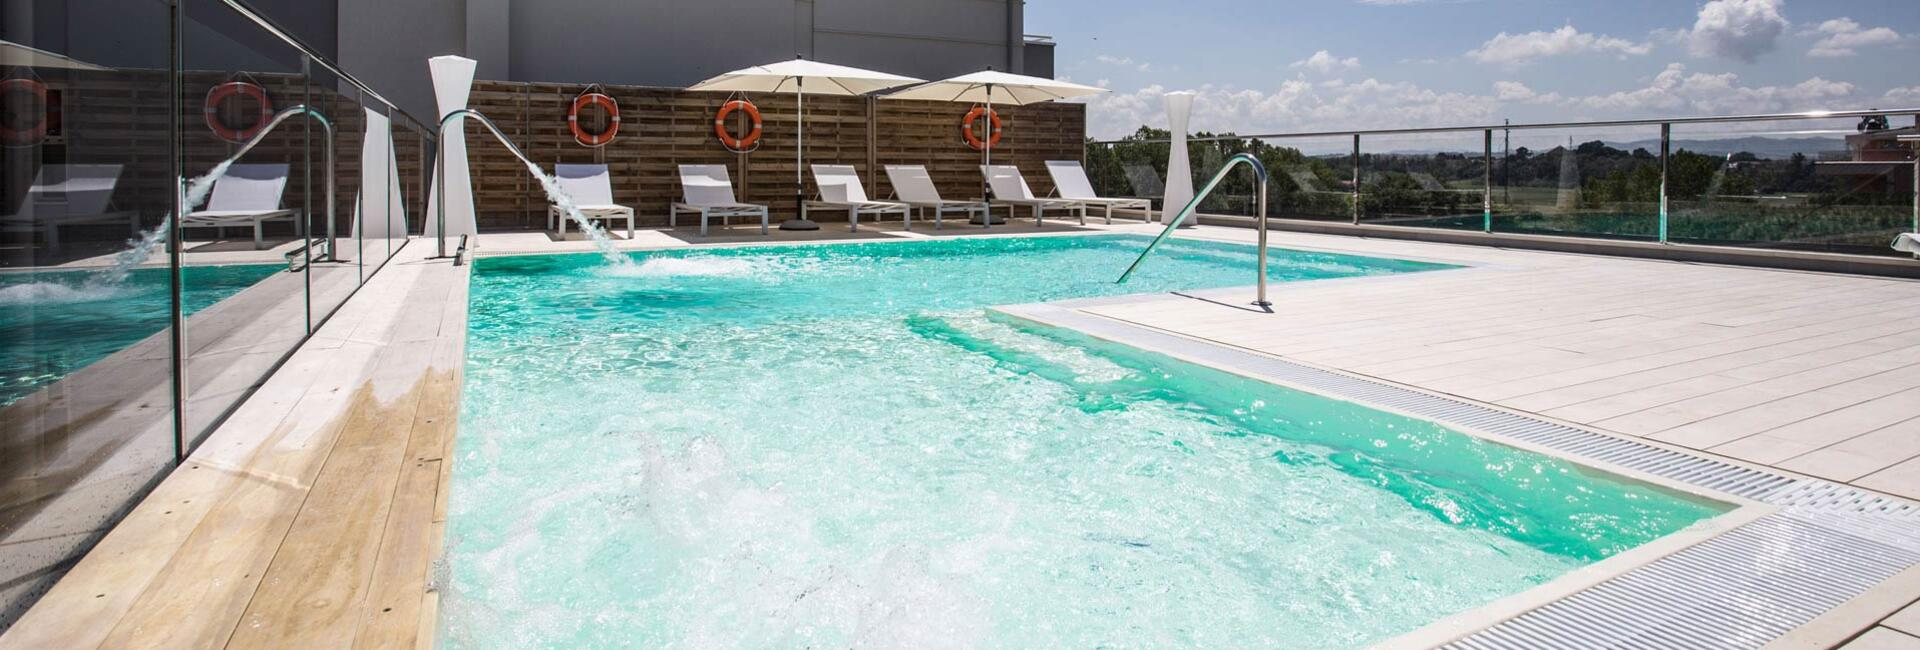 hotelgalamisano it piscina 001